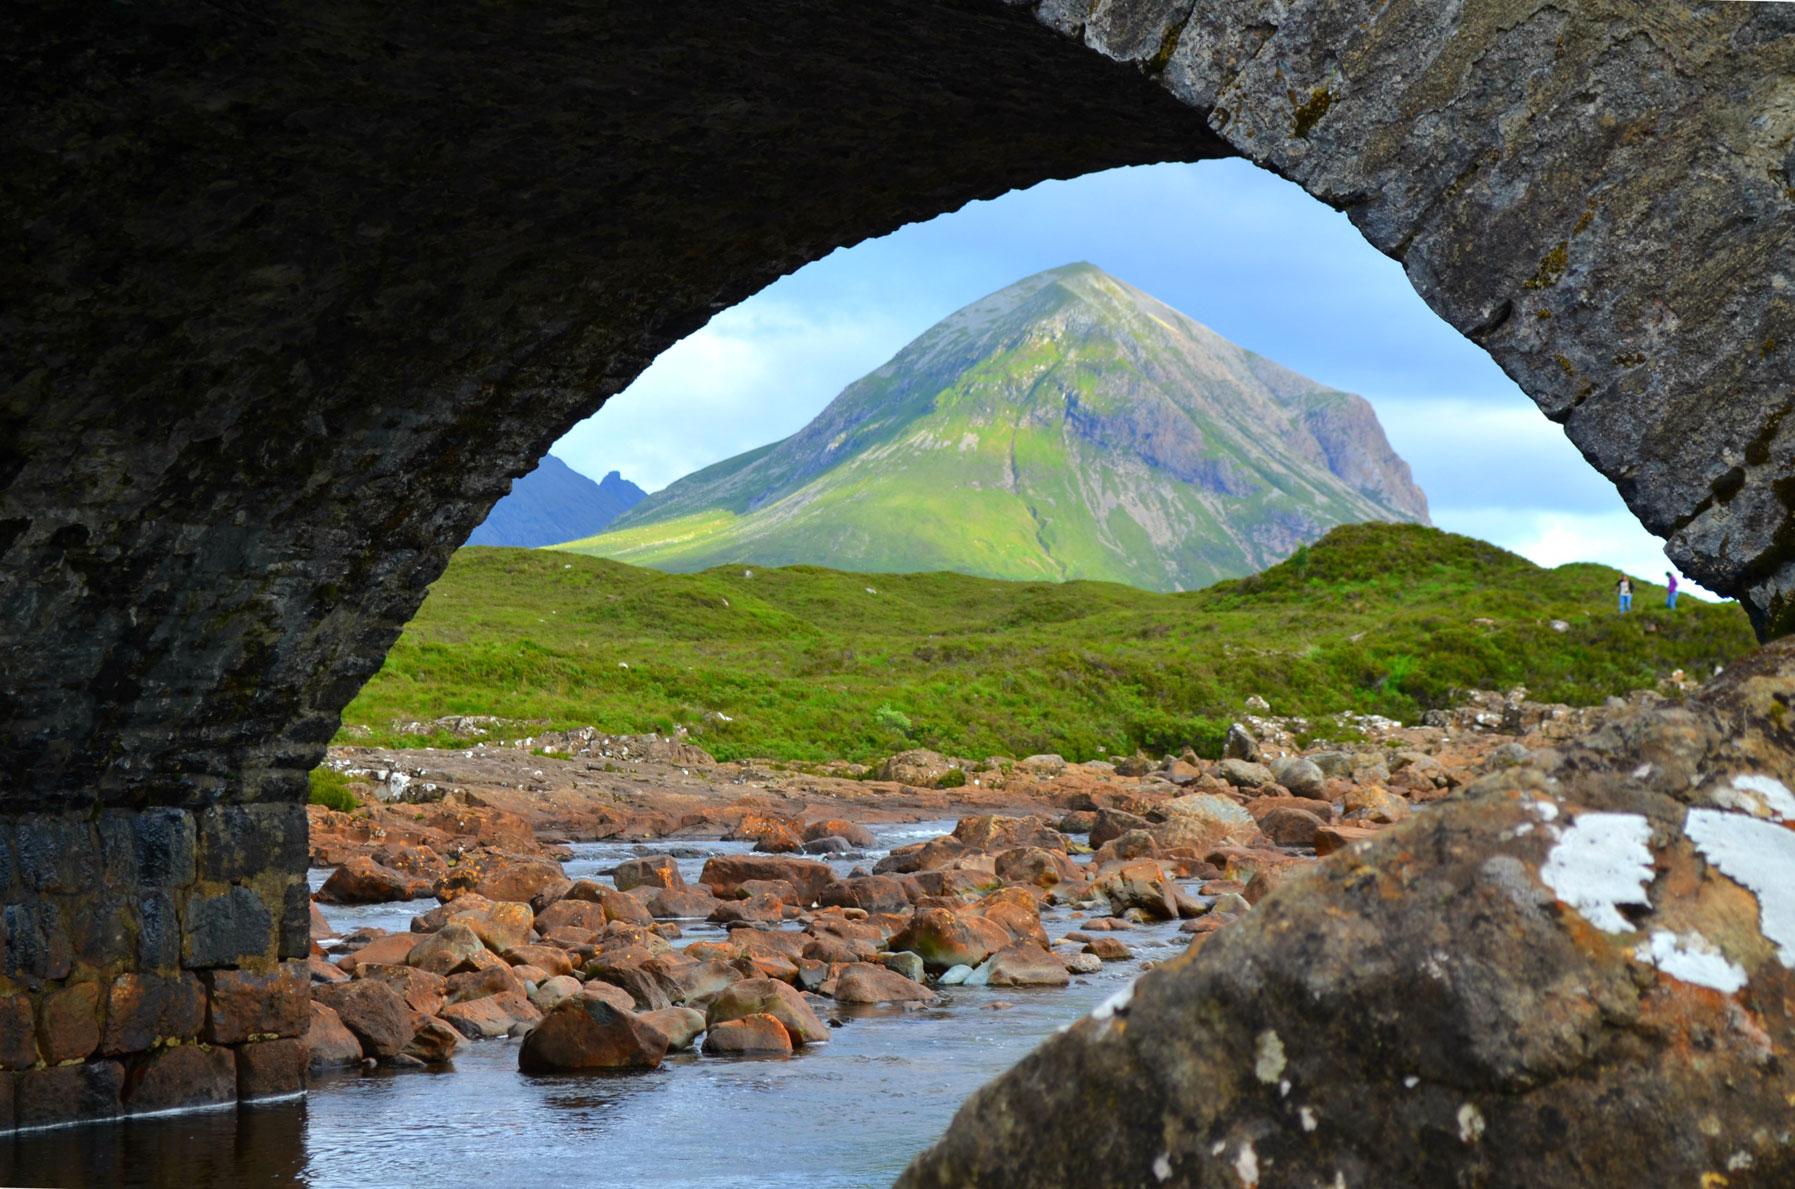 The mountain under the bridge